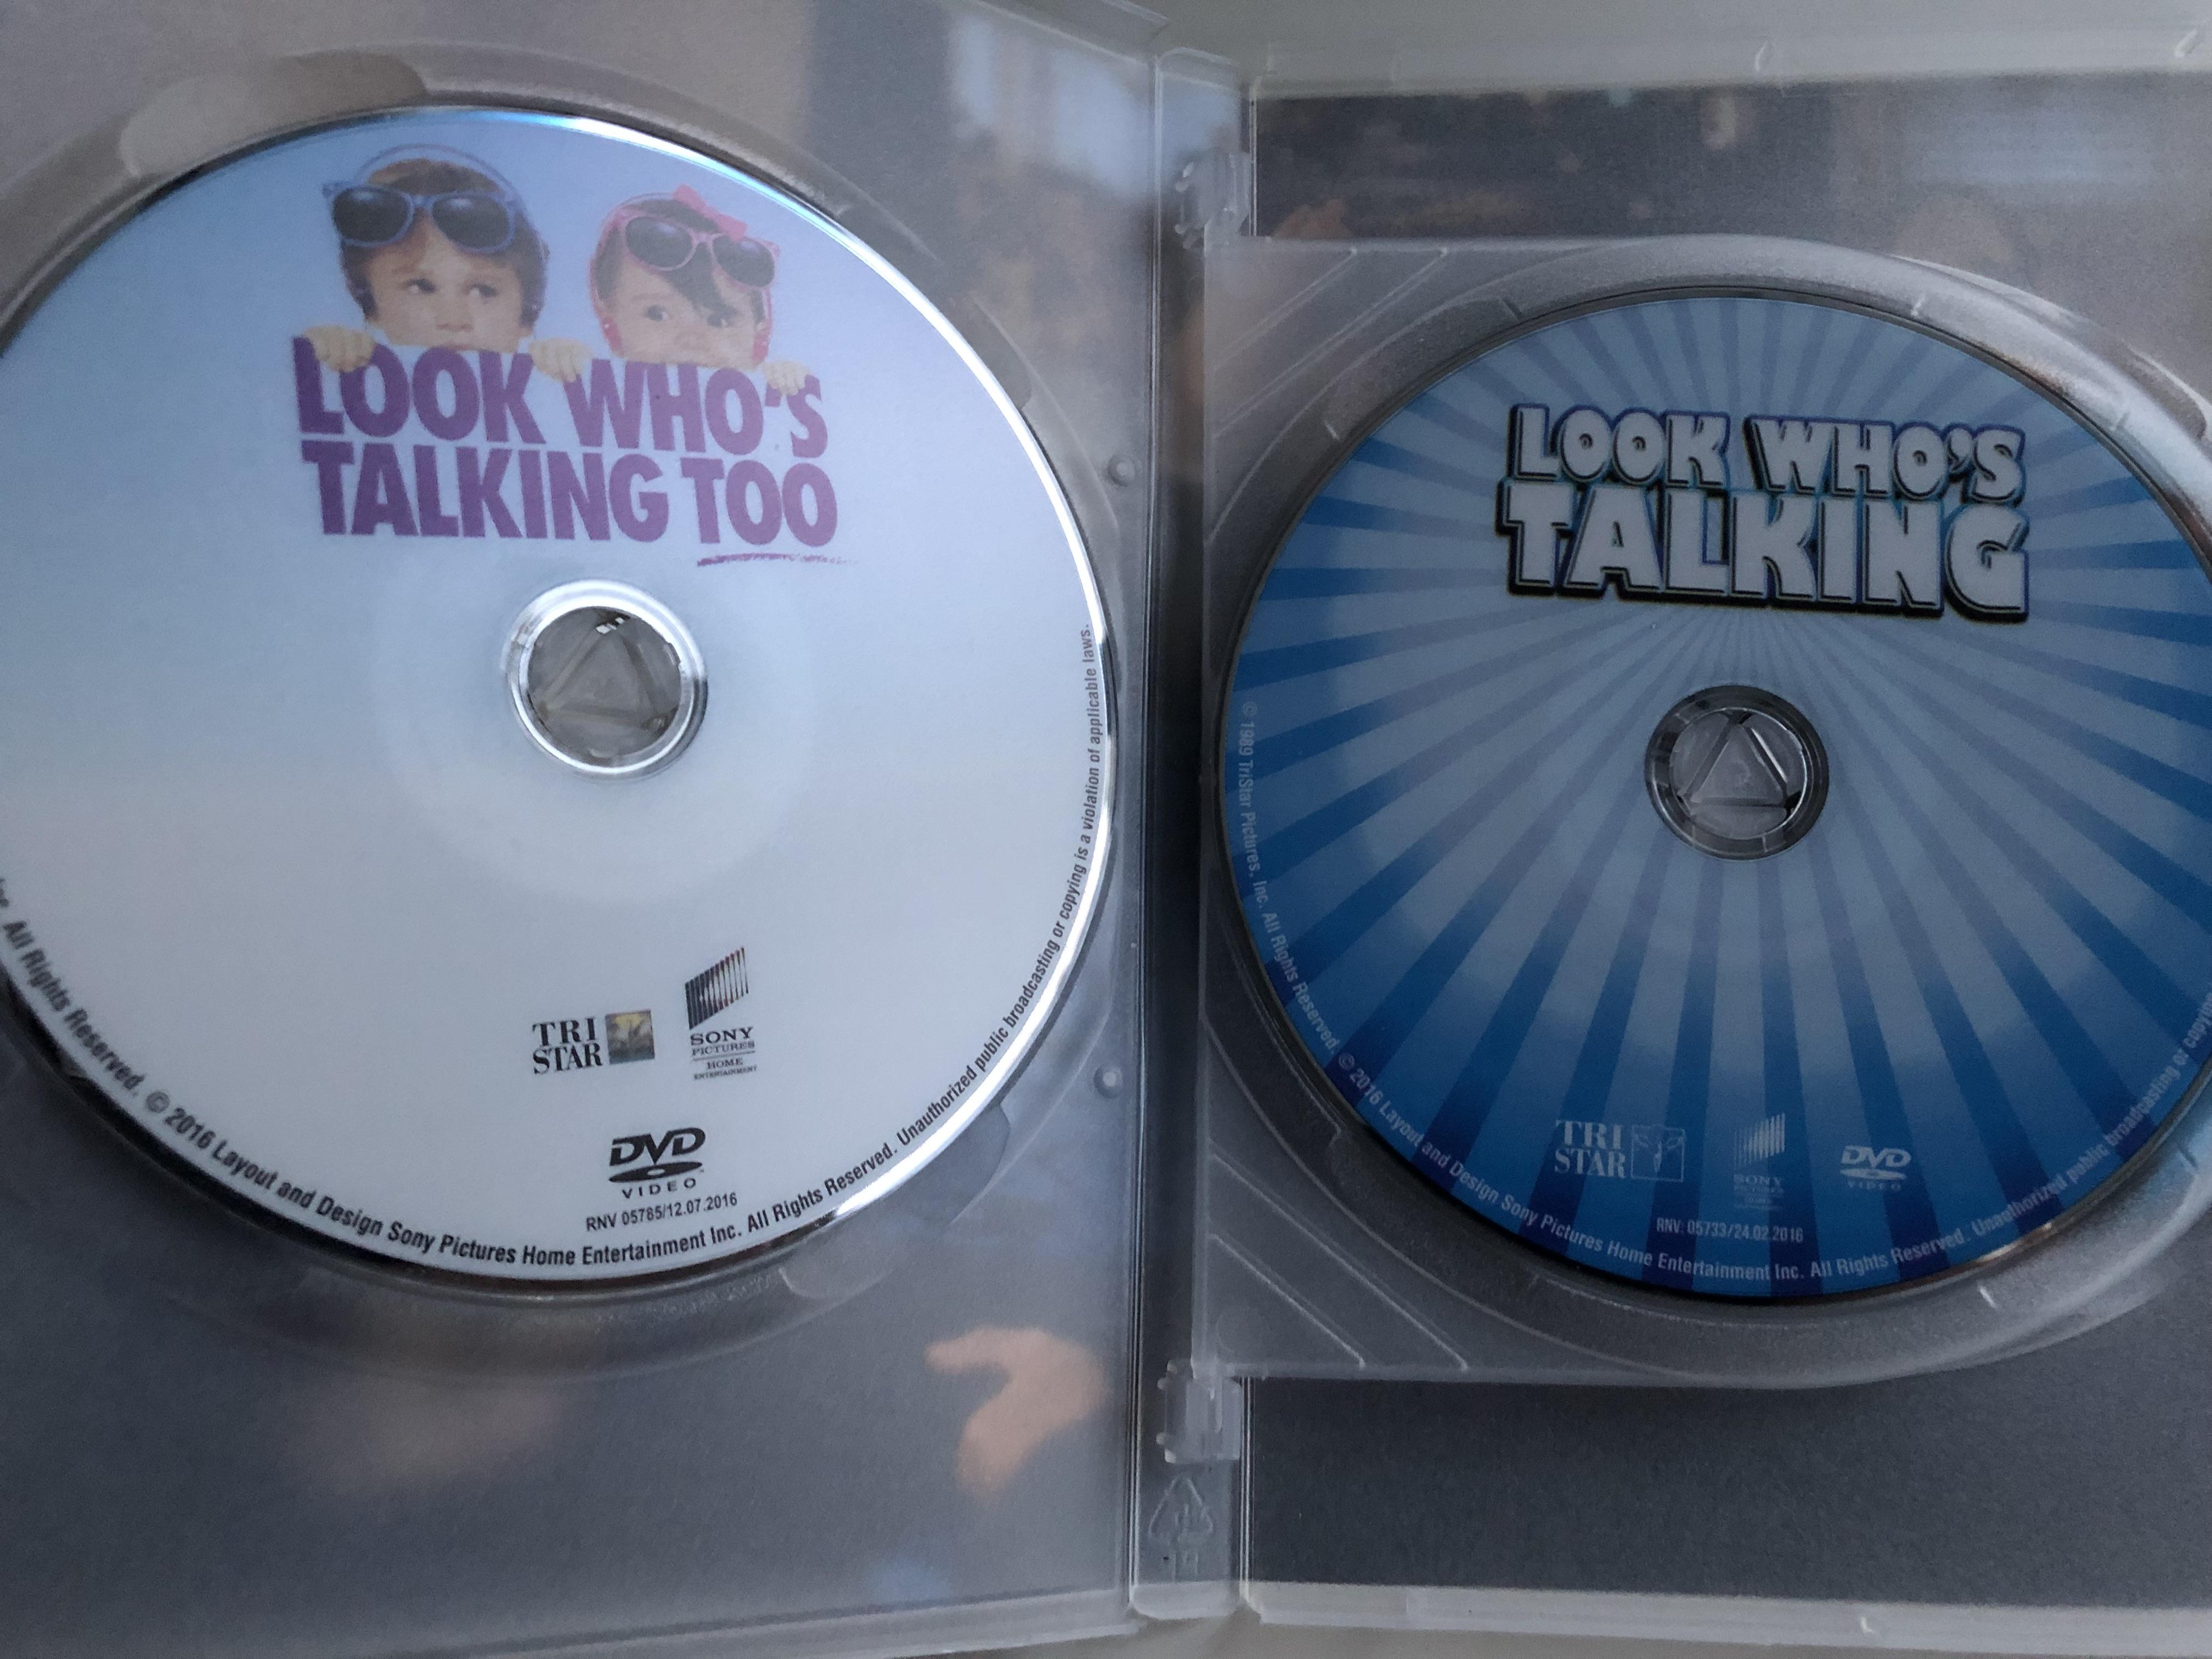 look-who-s-talking-dvd-set-nicsak-ki-besz-l-look-who-s-talking-too-look-who-s-talking-now-2.jpg